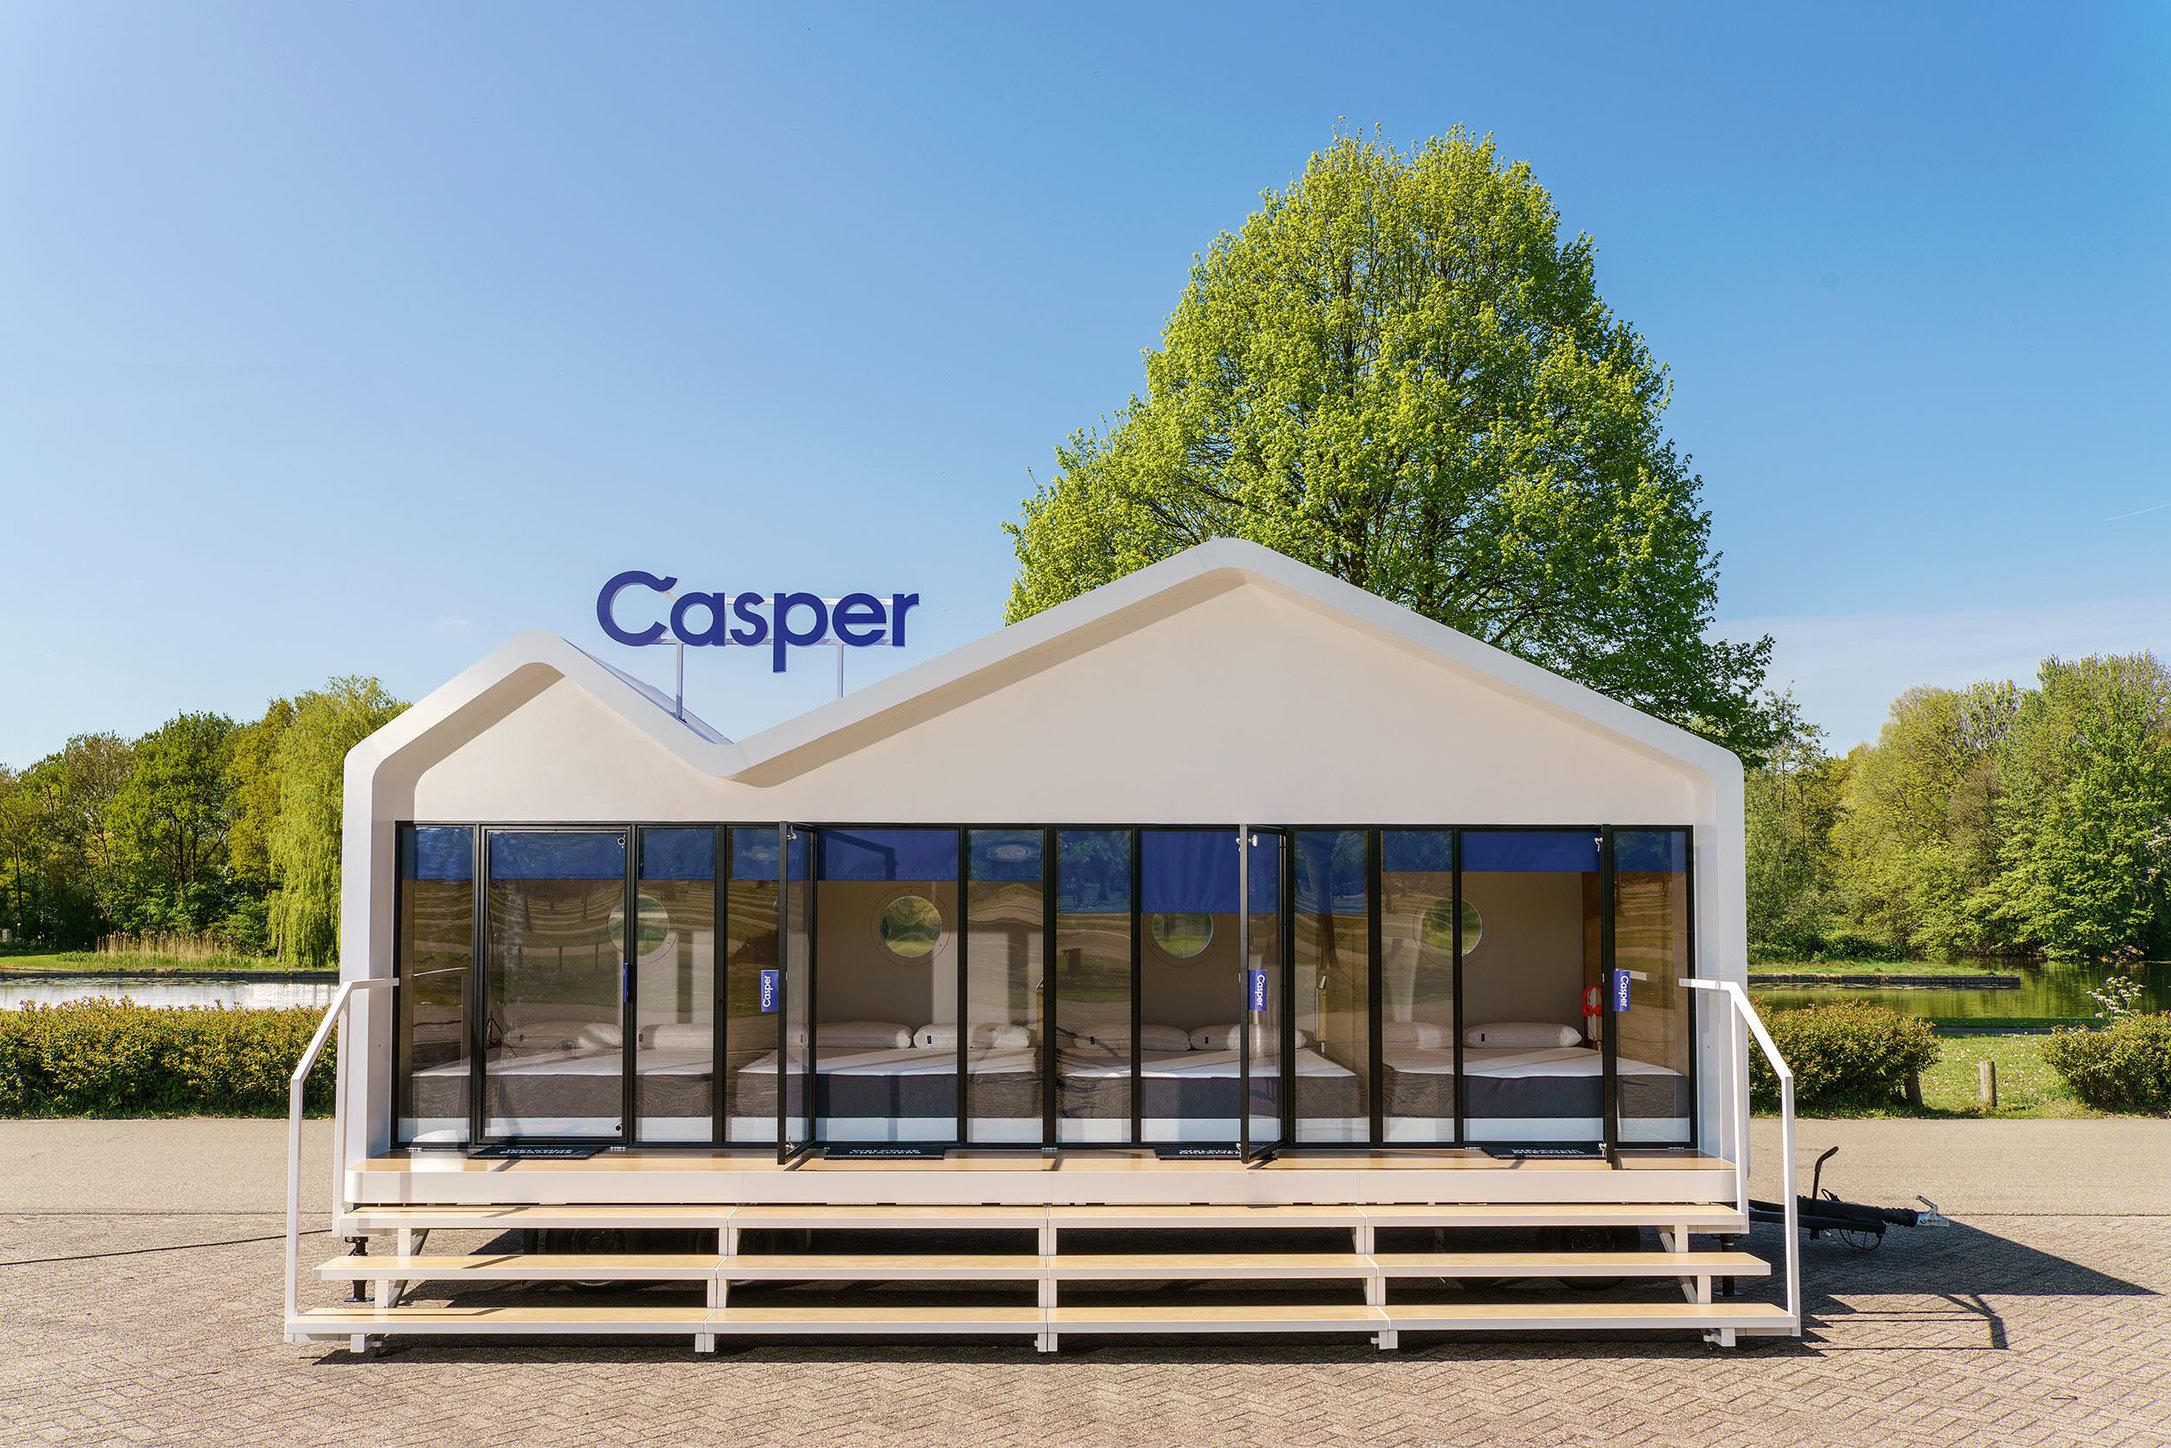 20170510 Casper-Wink by_M_Immink 047.jpg